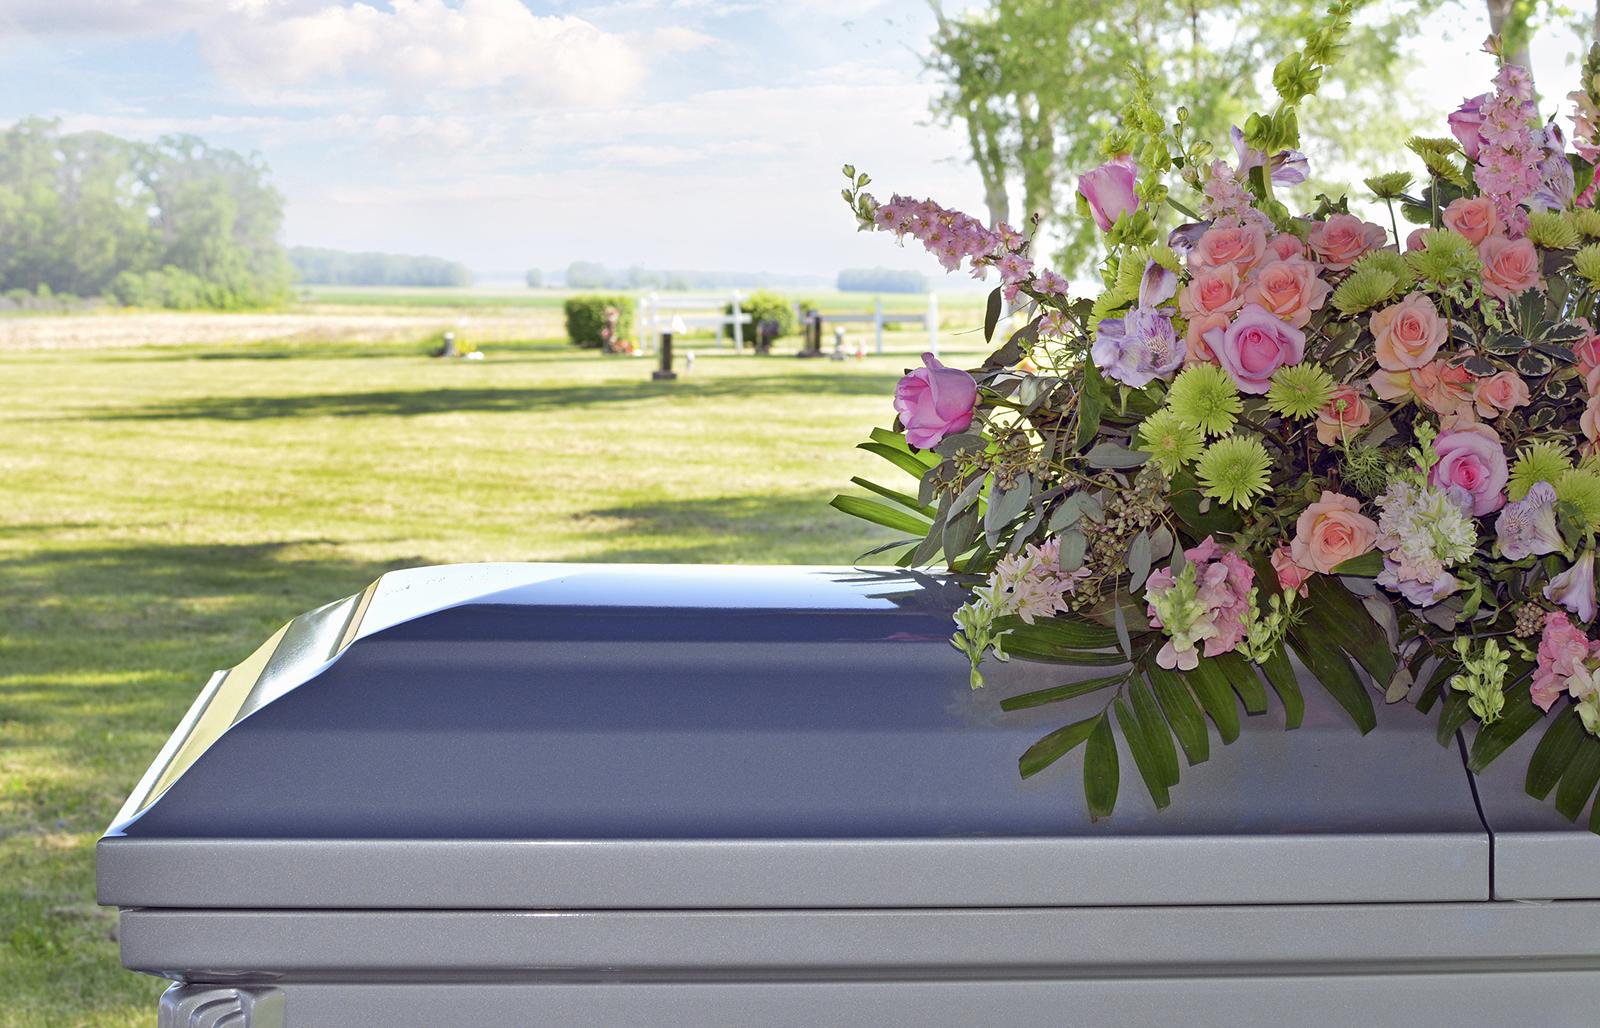 12 Funeral Flower Arrangement Ideas And Images Lovetoknow